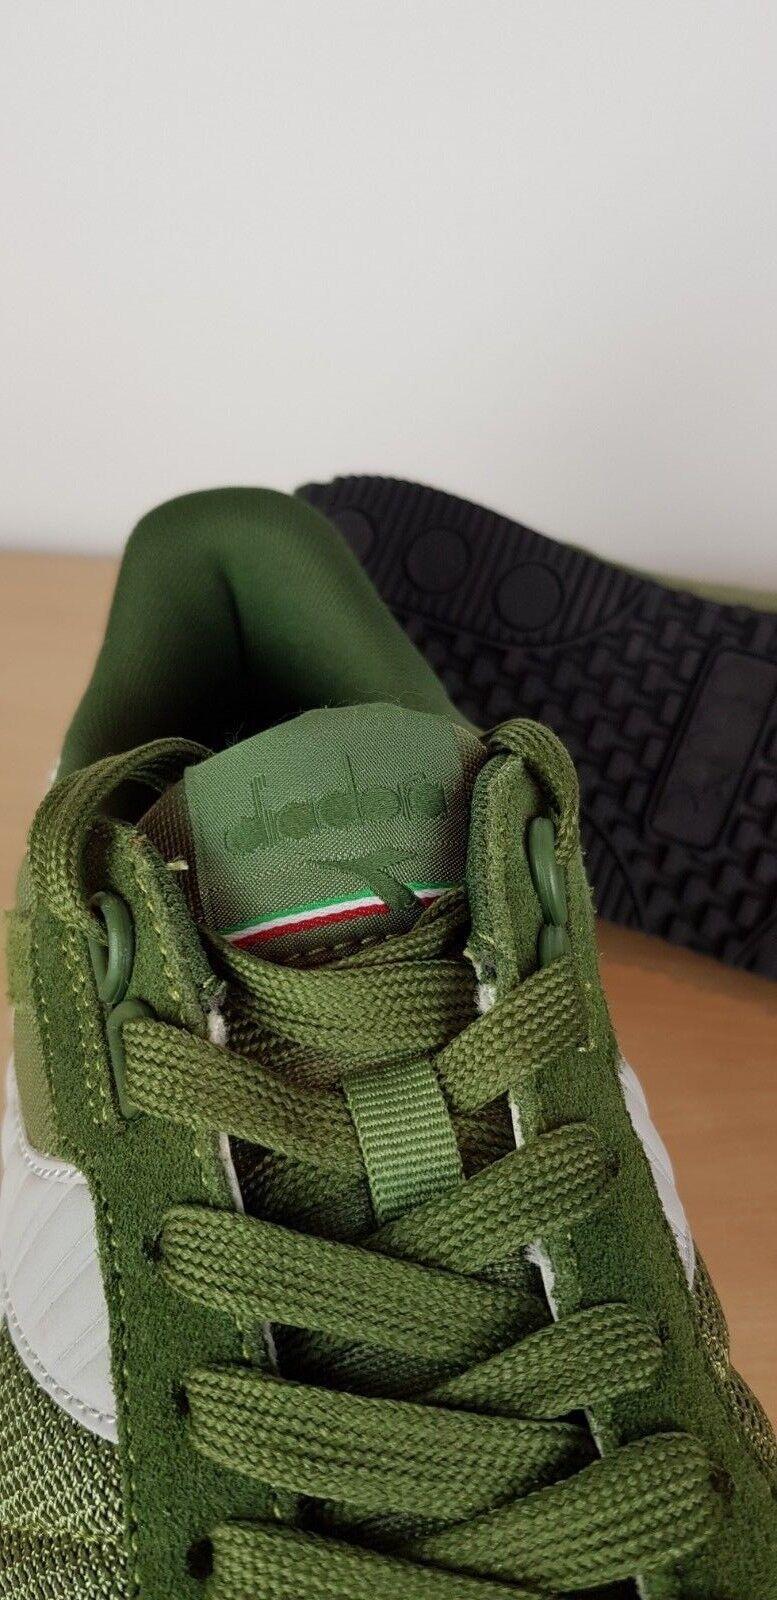 Diadora Homme II Vert Kaki Titan II Homme Daim & Textile Rétro Casuals baskets, UK 8 7b2843